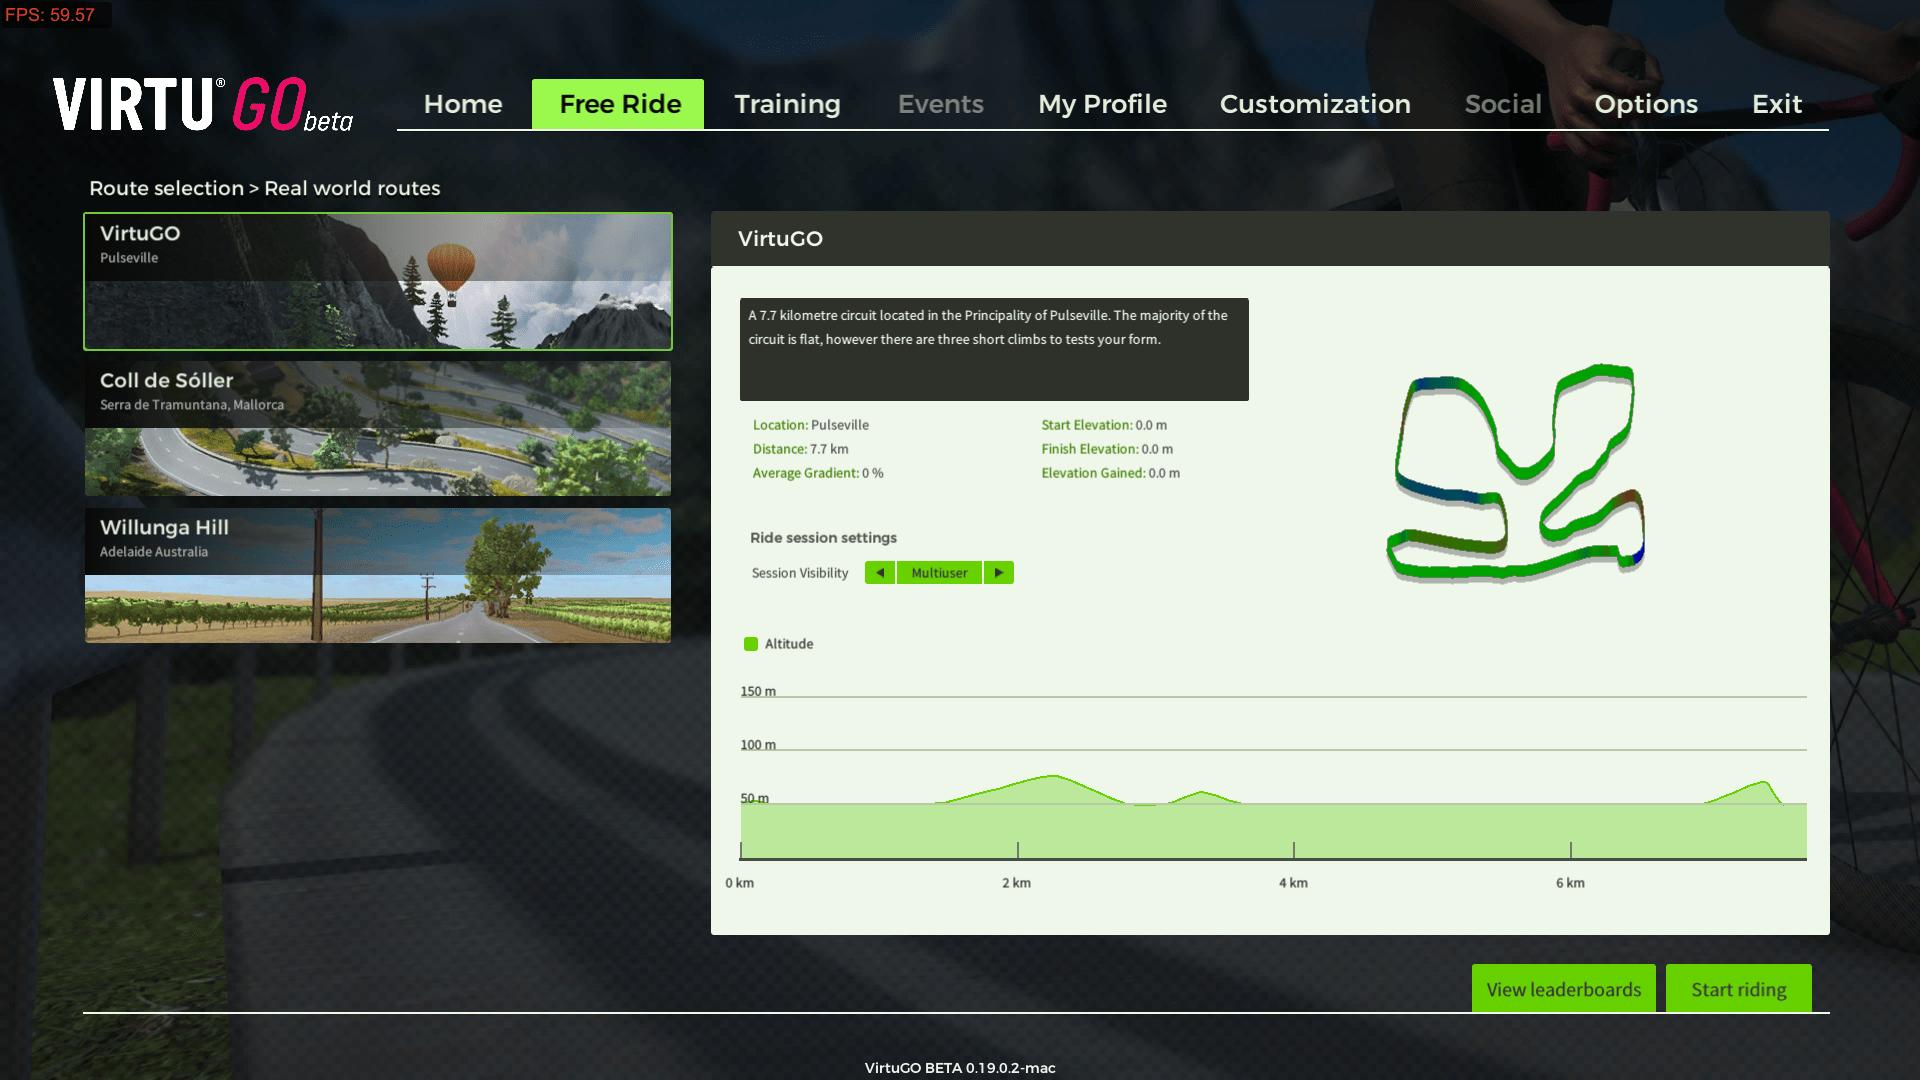 VirtuGO Beta Free Ride Route 1 - VirtuGO (7.7 Km)